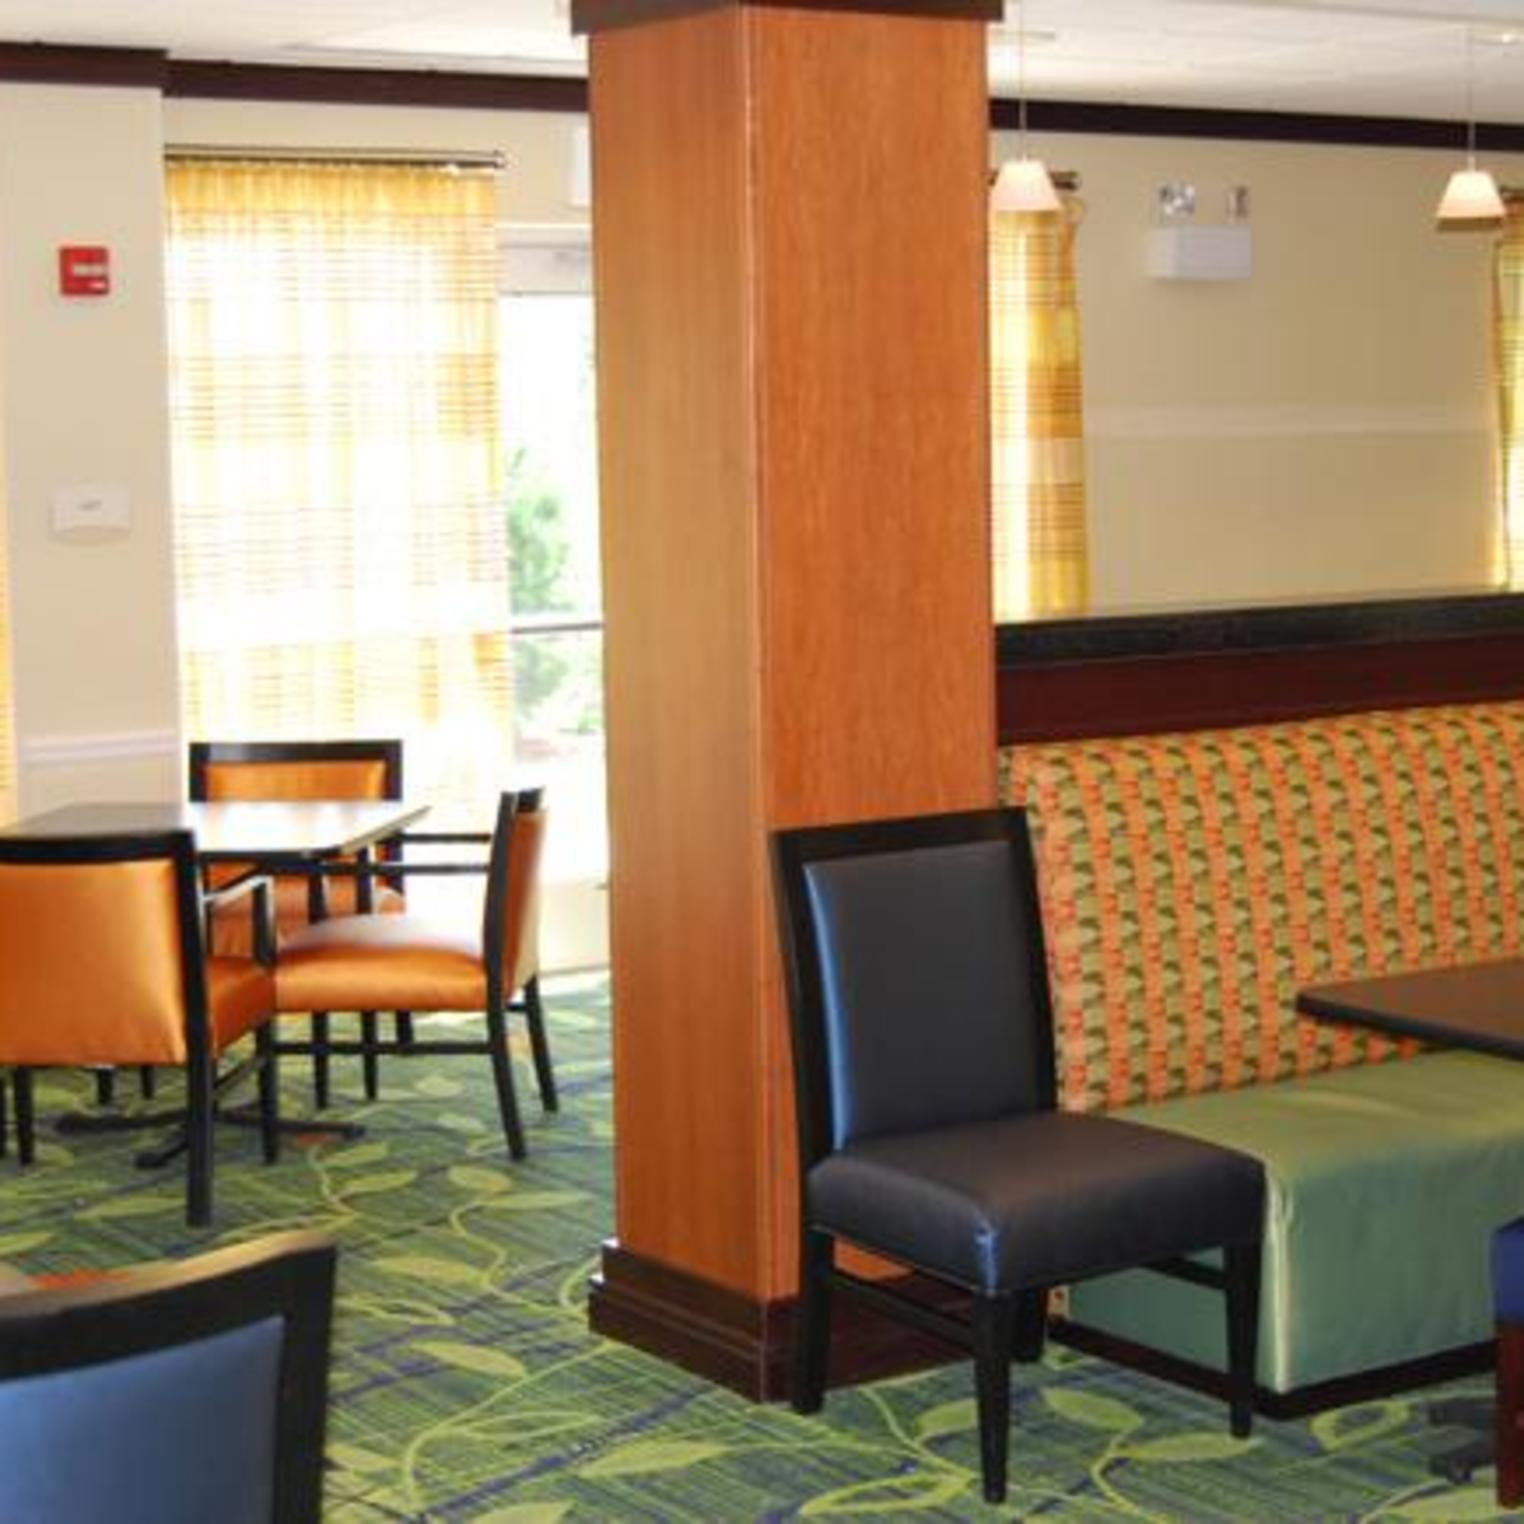 Fairfield Inn & Suites Carlisle breakfast area